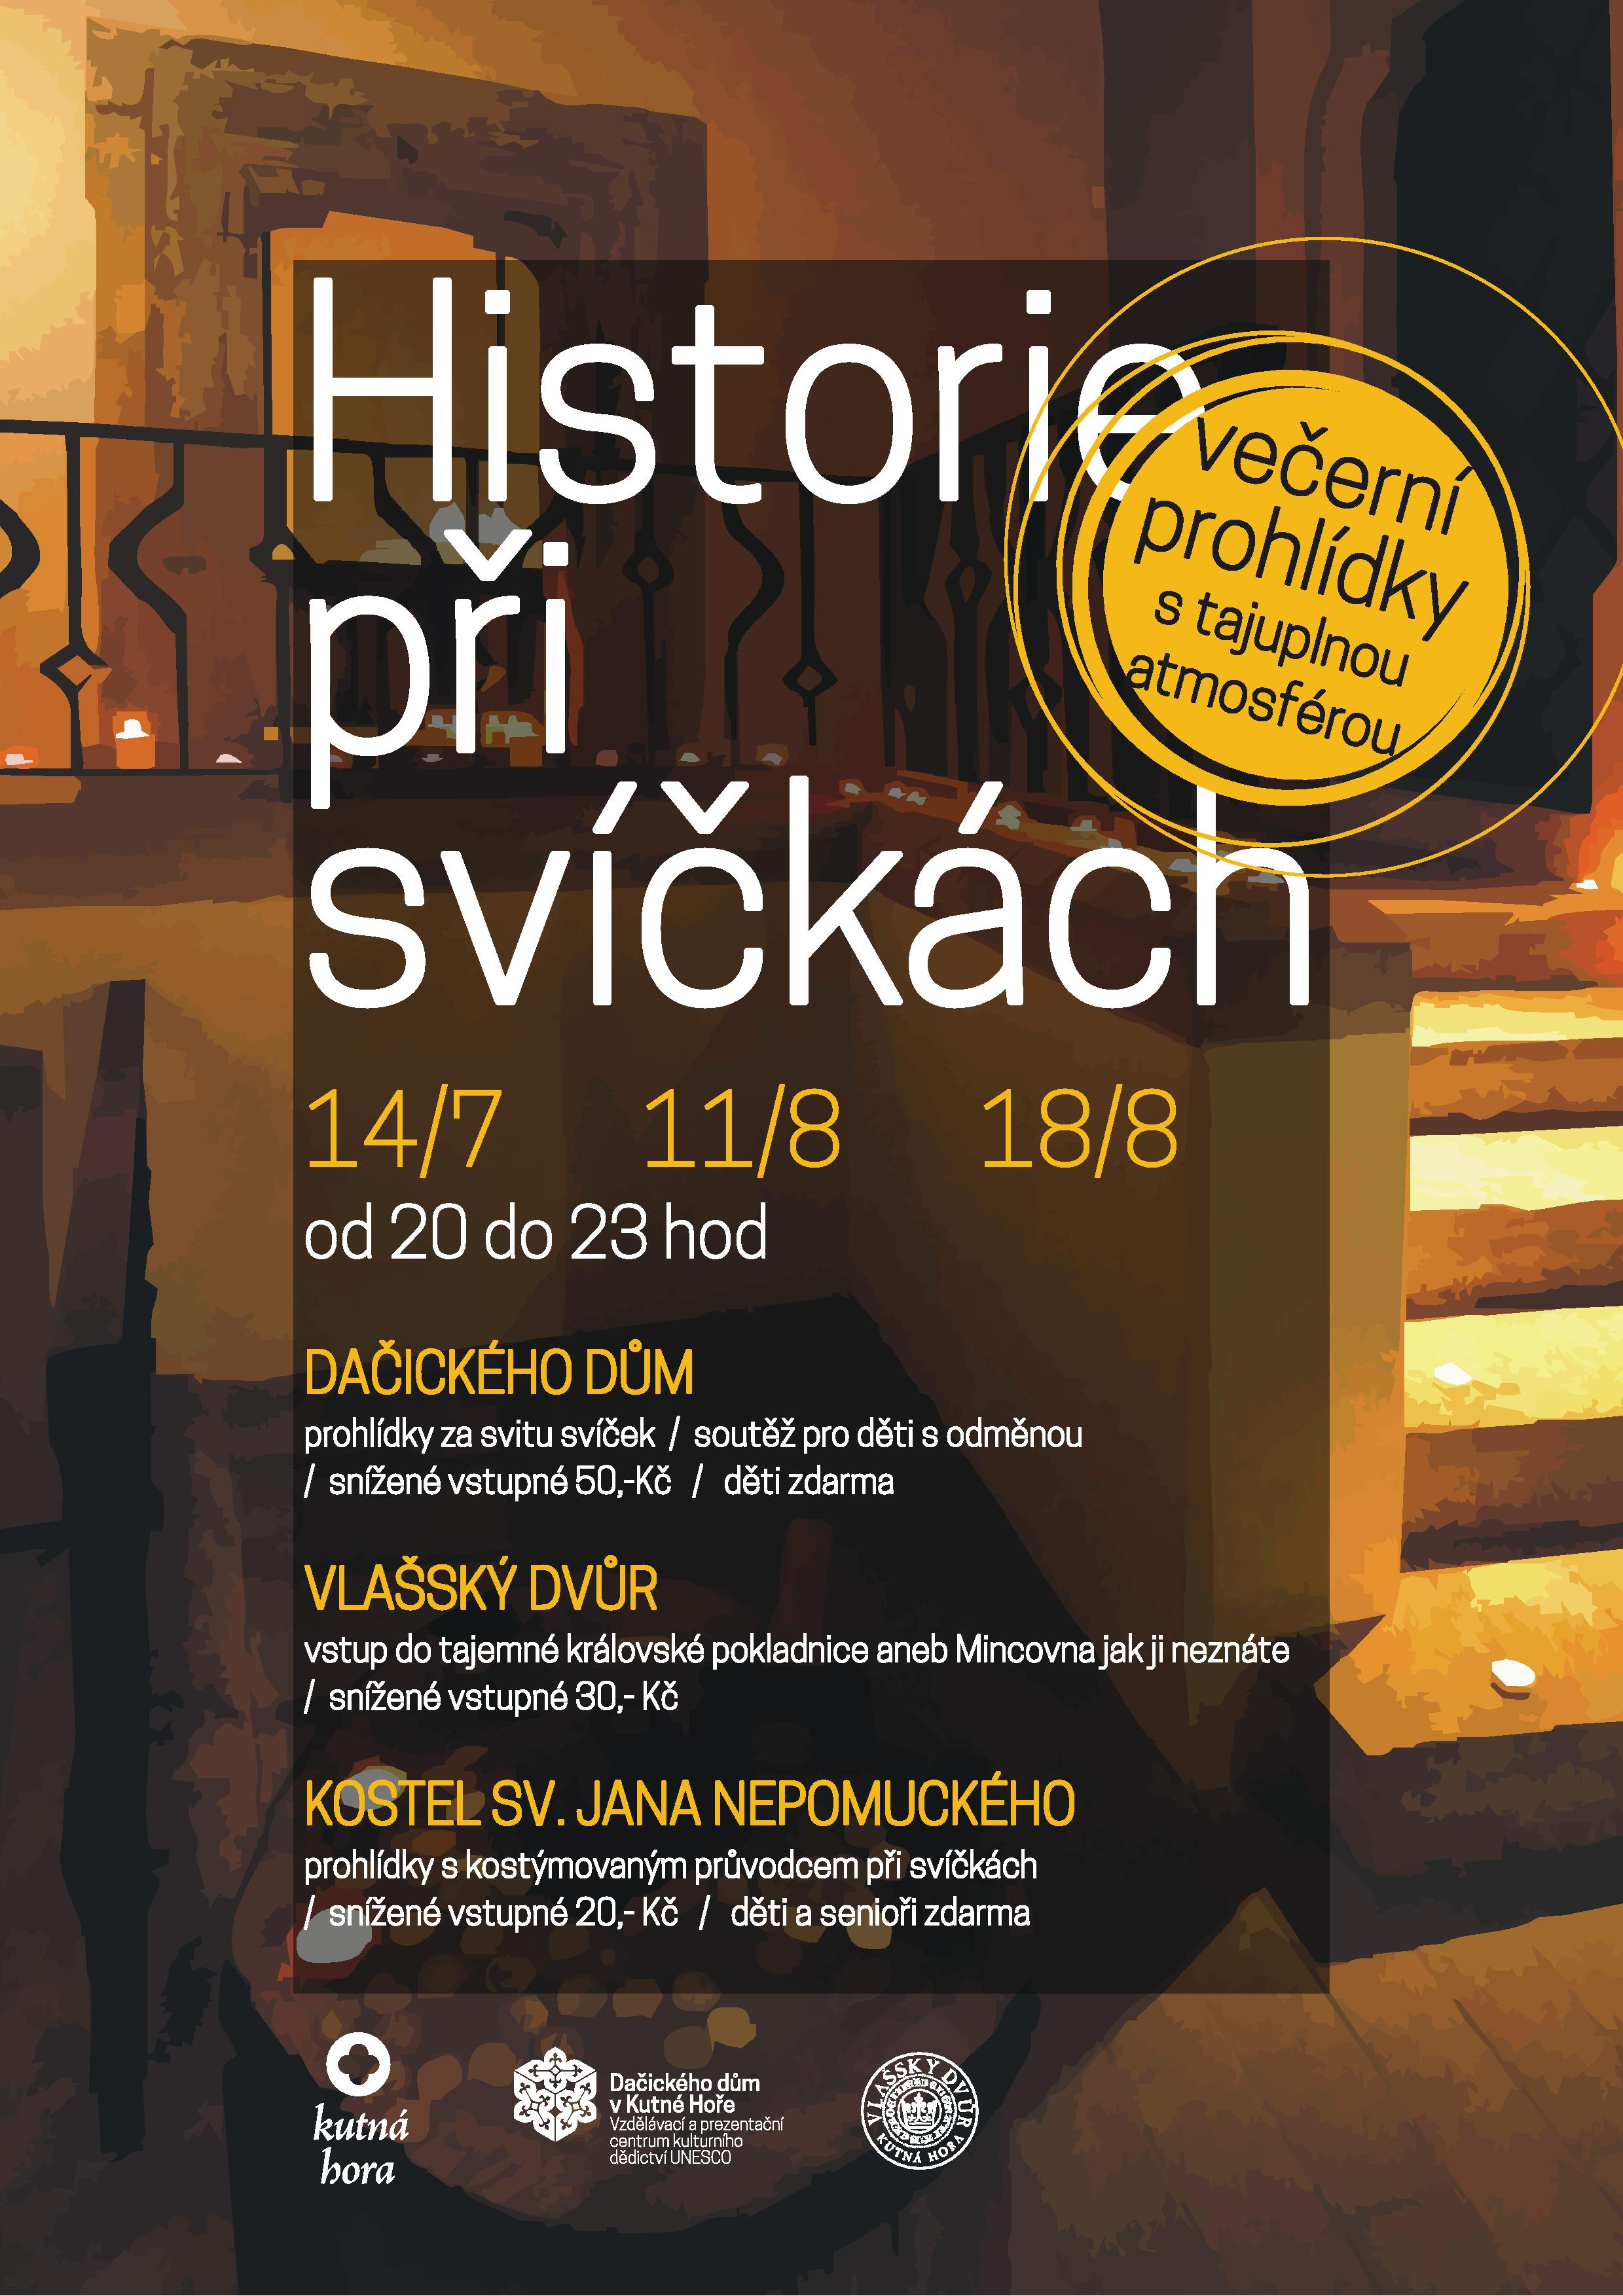 3861-historie-pri-svickach-plakat-03.jpg